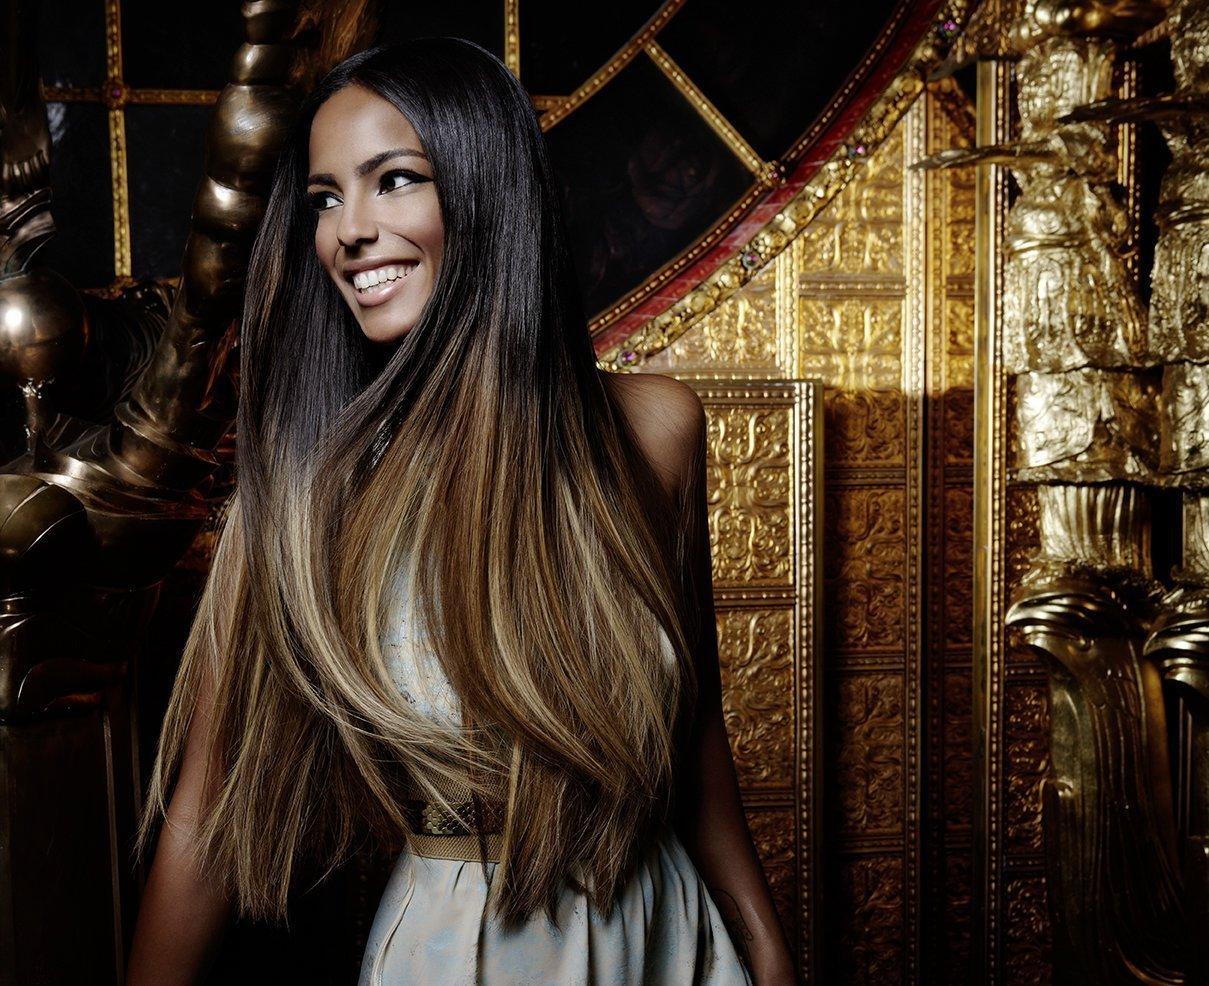 Фото девушки с красивыми косами